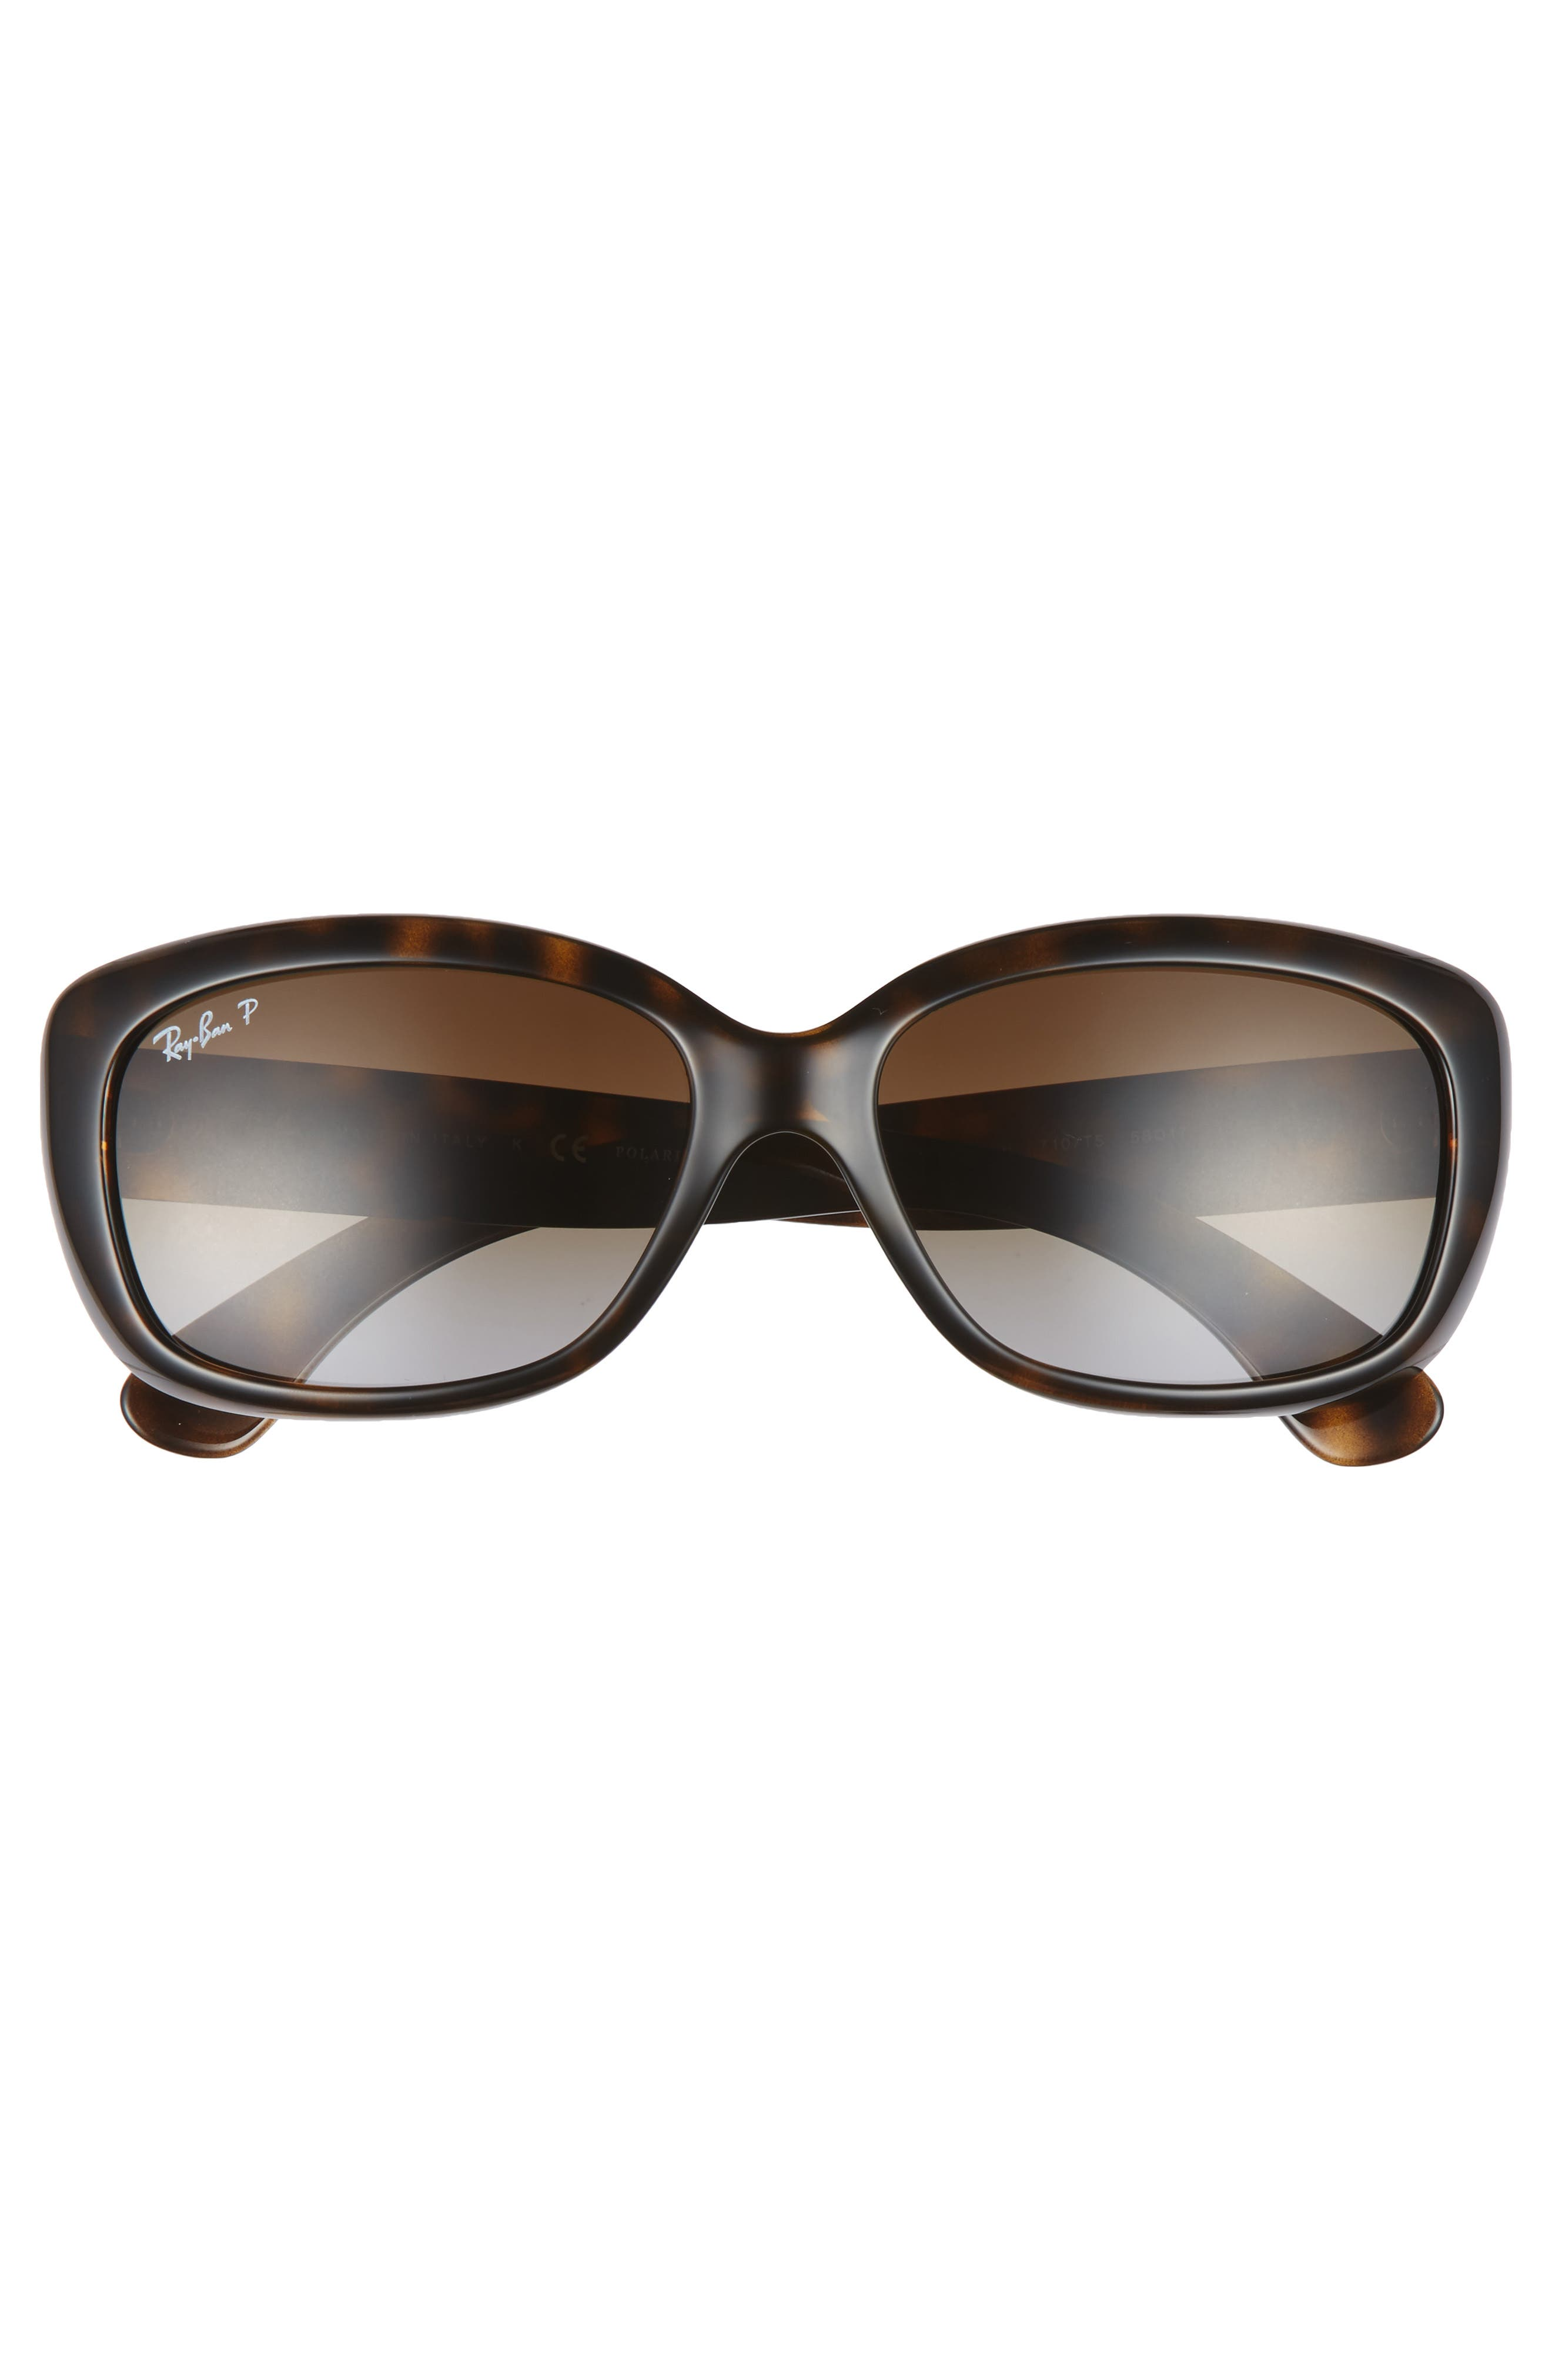 58mm Polarized Sunglasses,                             Alternate thumbnail 3, color,                             Havana